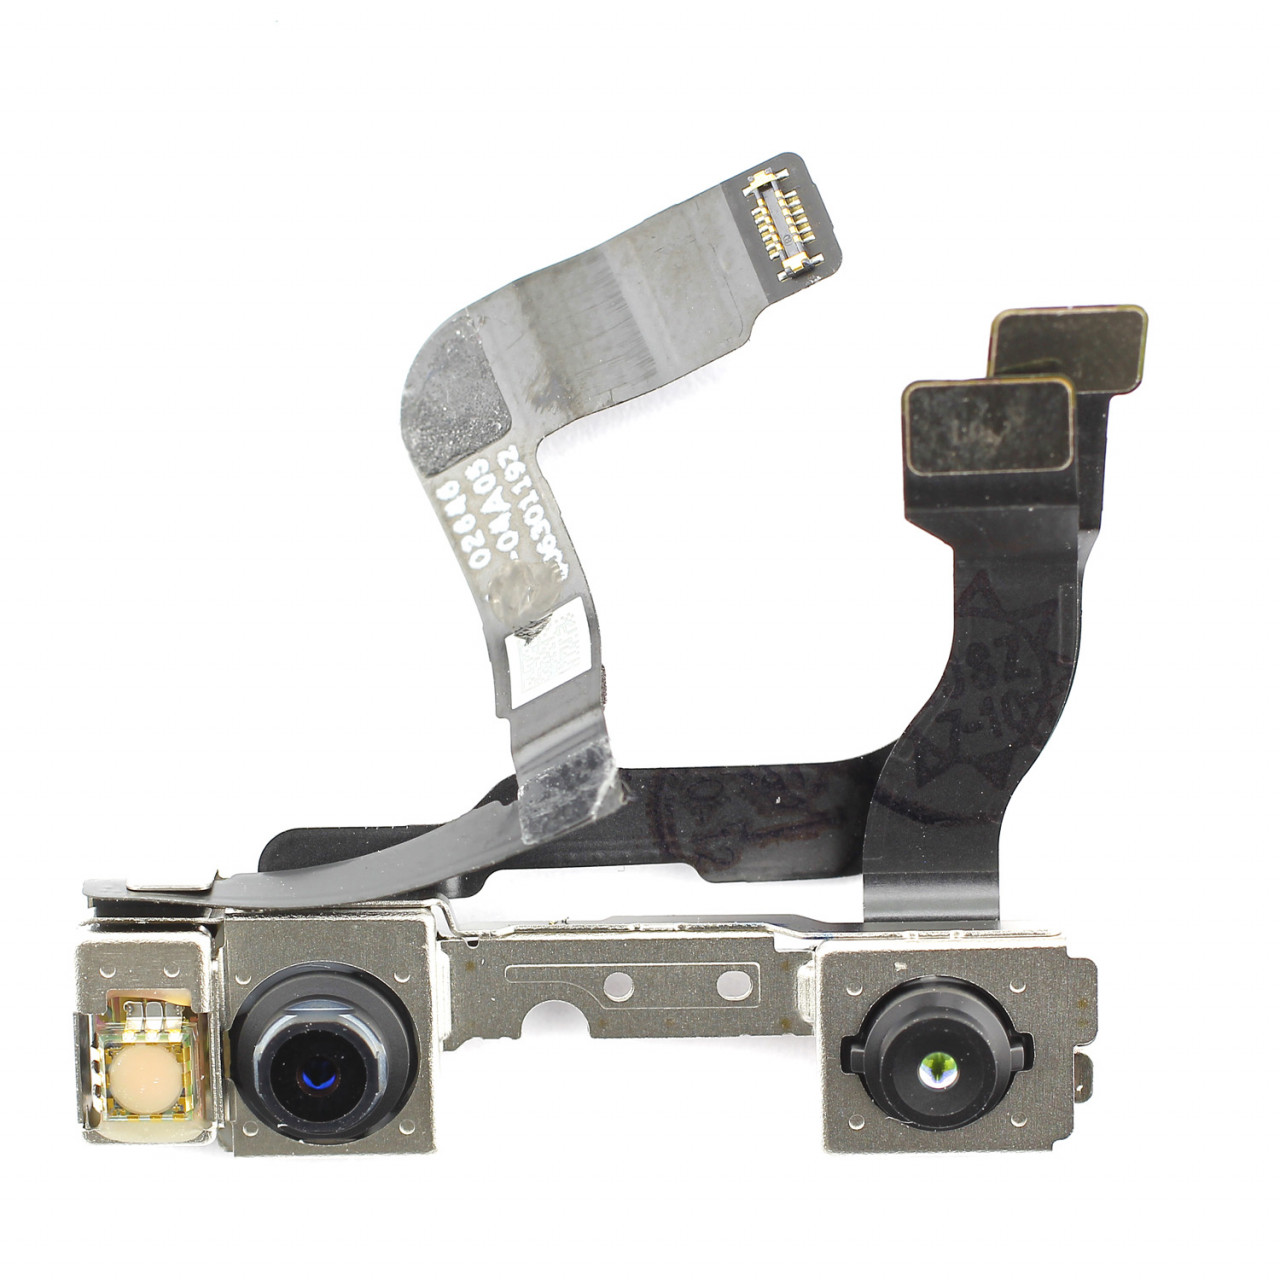 Apple Frontkamera-Modul mit Face ID, 12MP, für iPhone 12 / iPhone 12 Pro